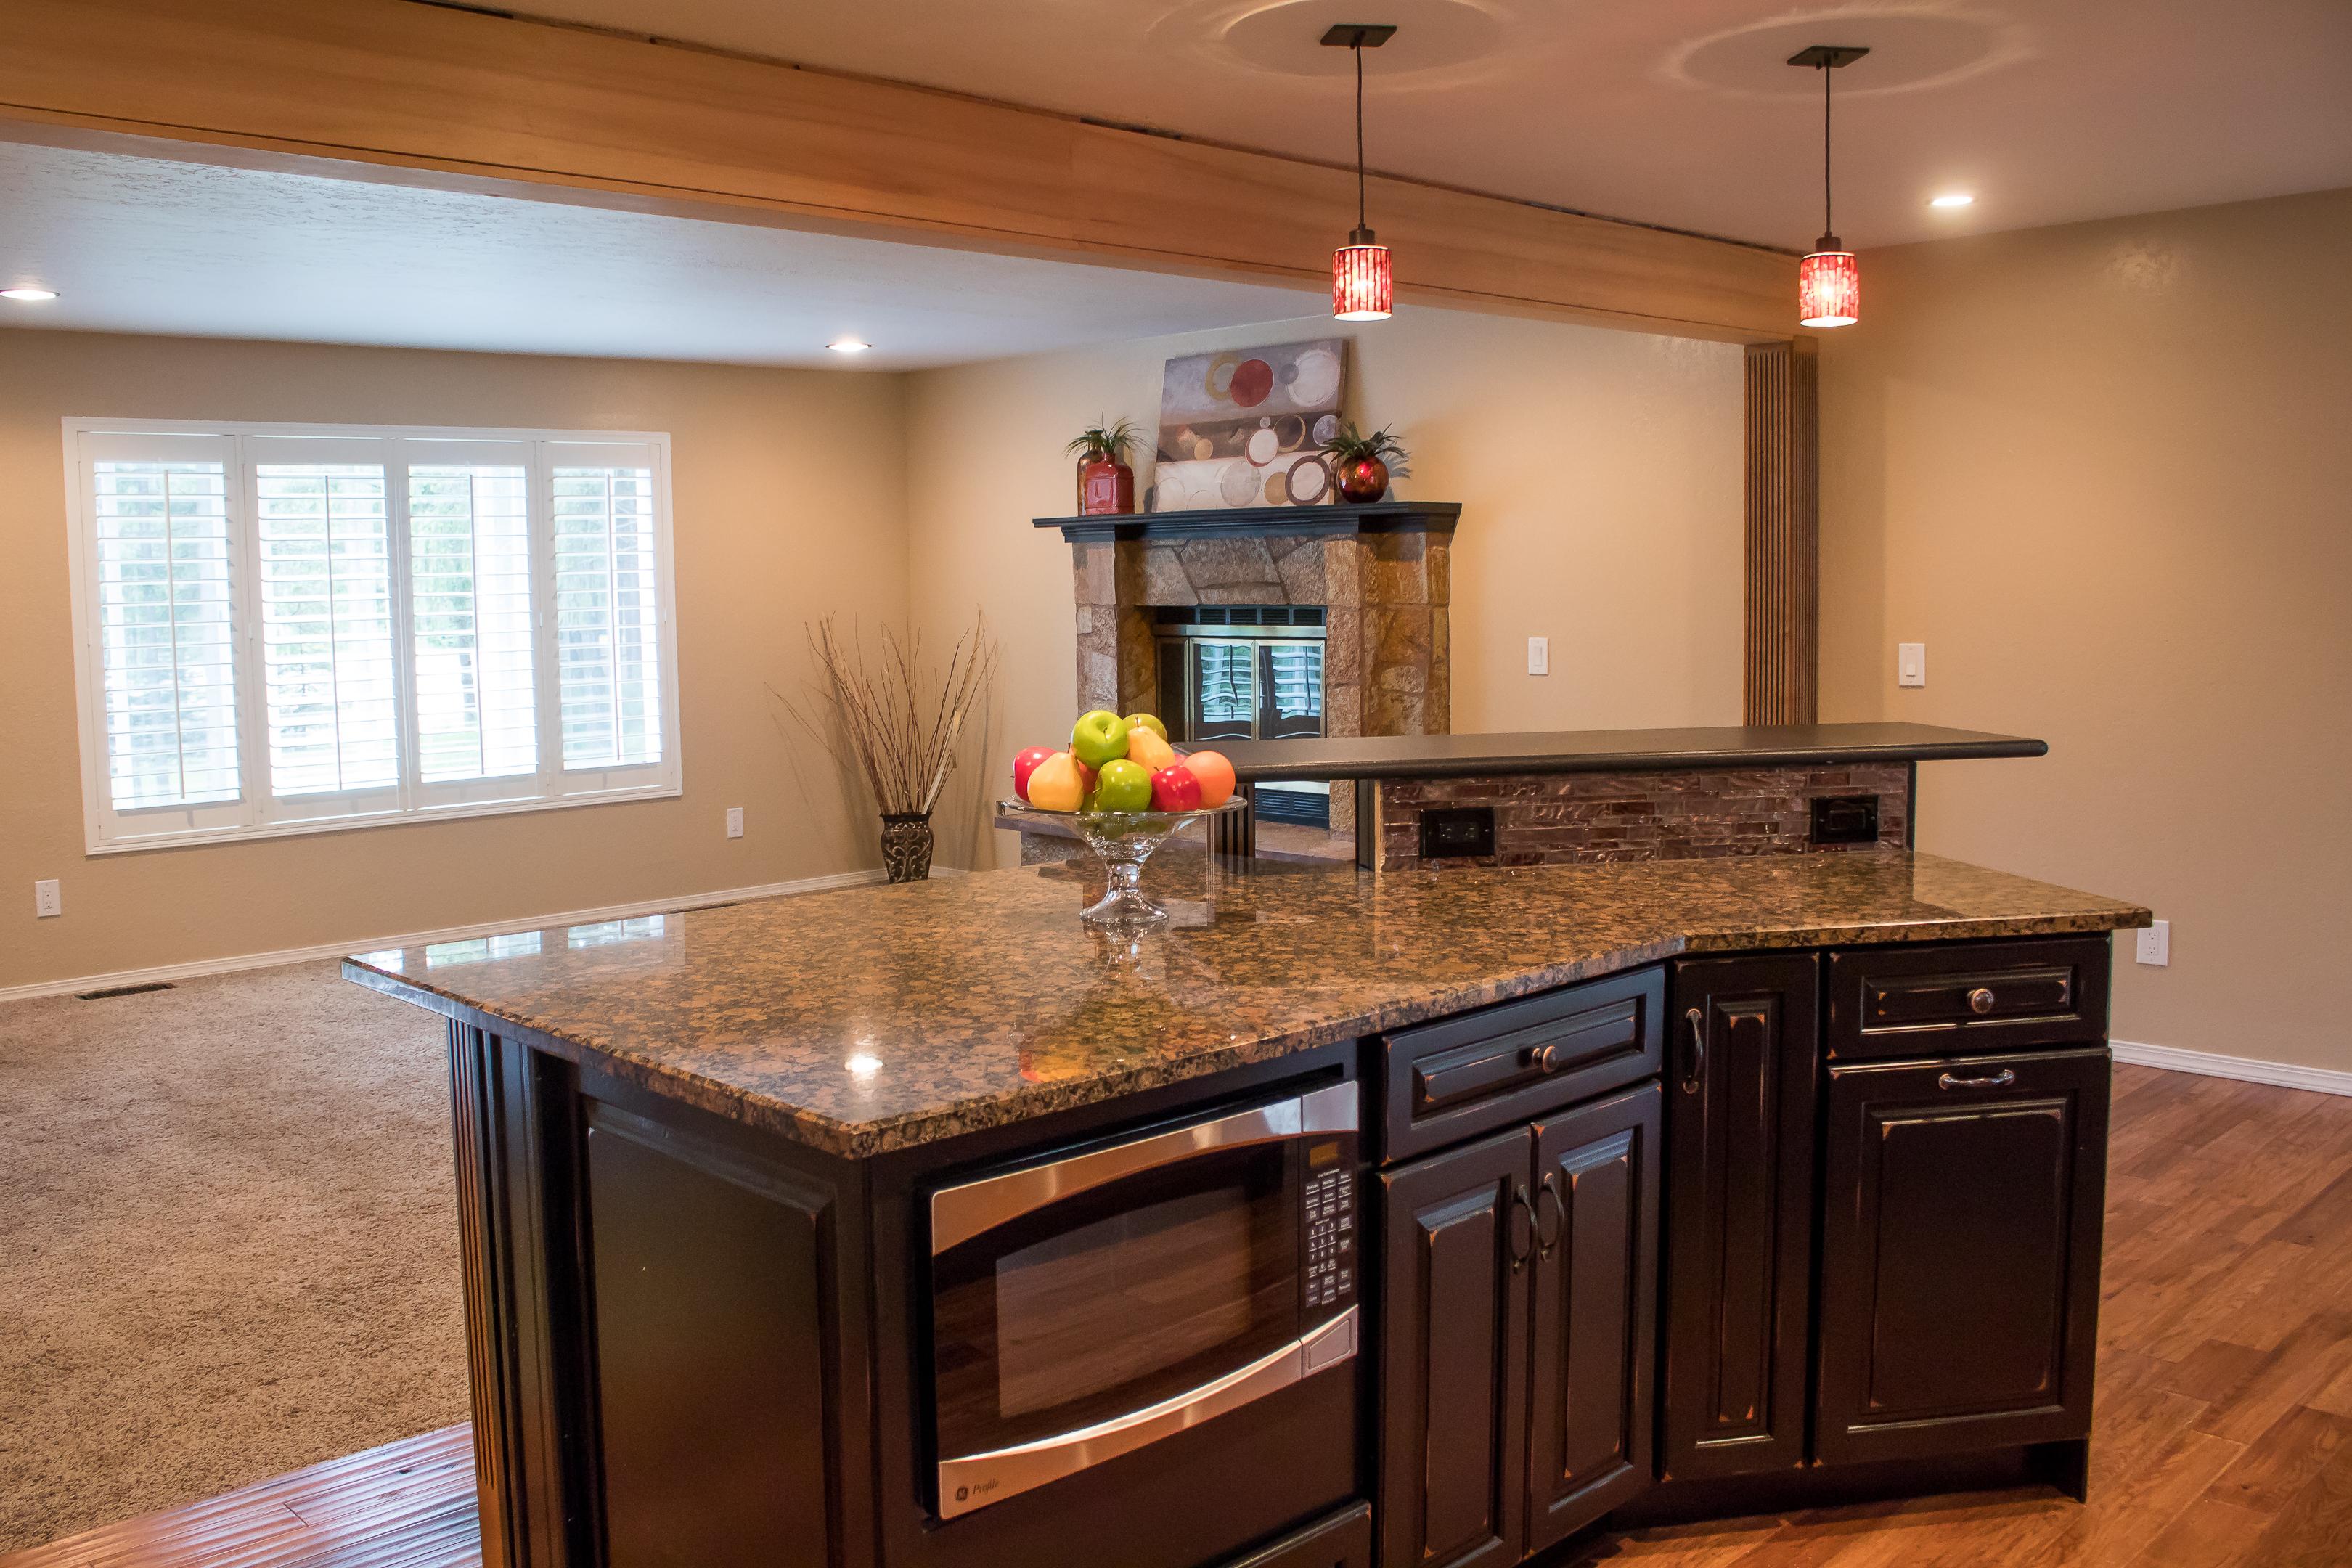 20170604 McArdle Real Estate -AEF 8